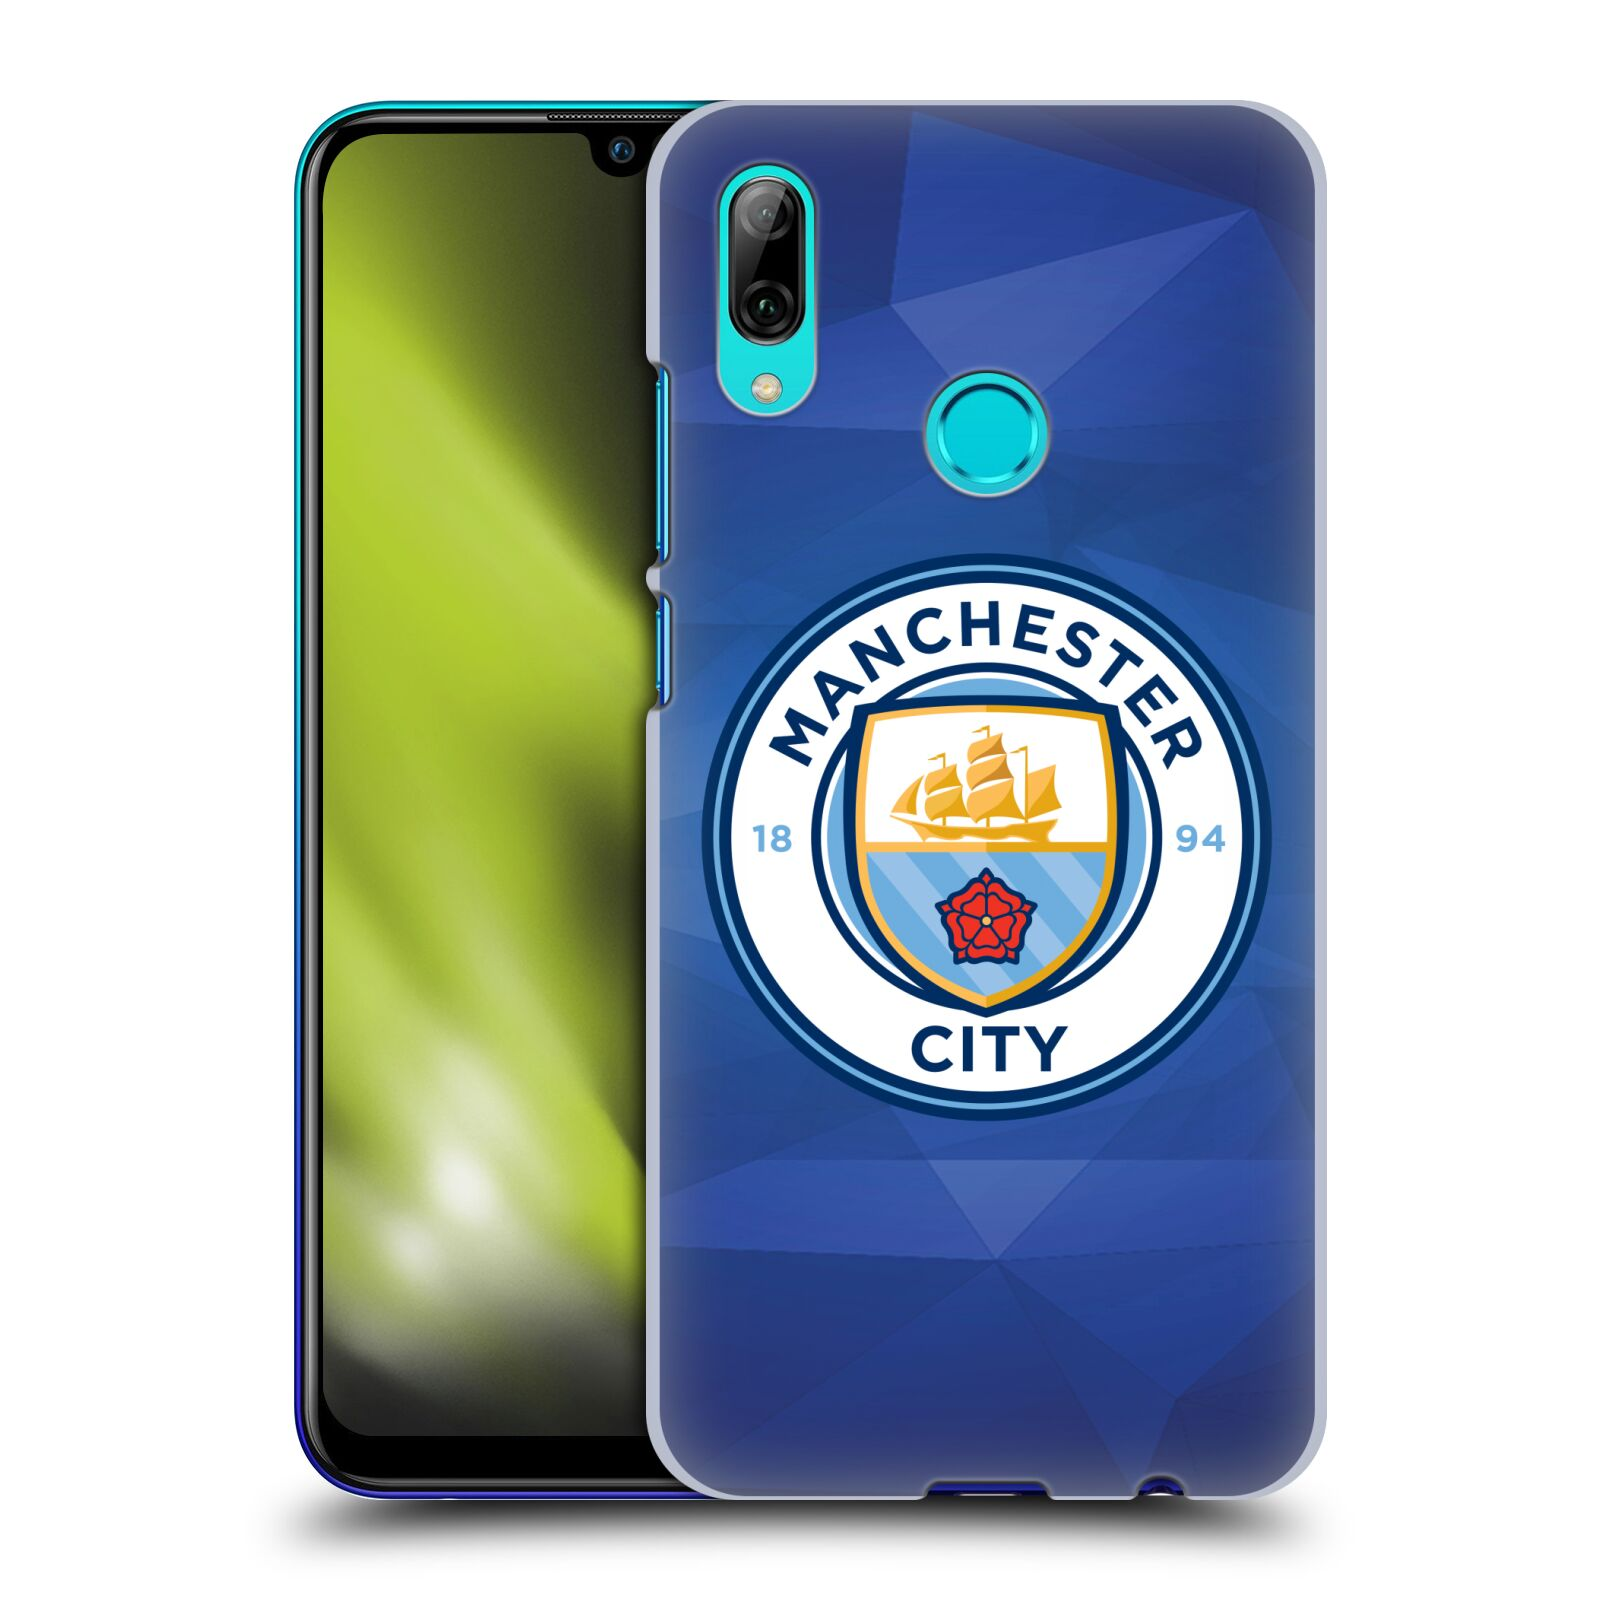 Plastové pouzdro na mobil Huawei P Smart (2019) - Head Case - Manchester City FC - Modré nové logo